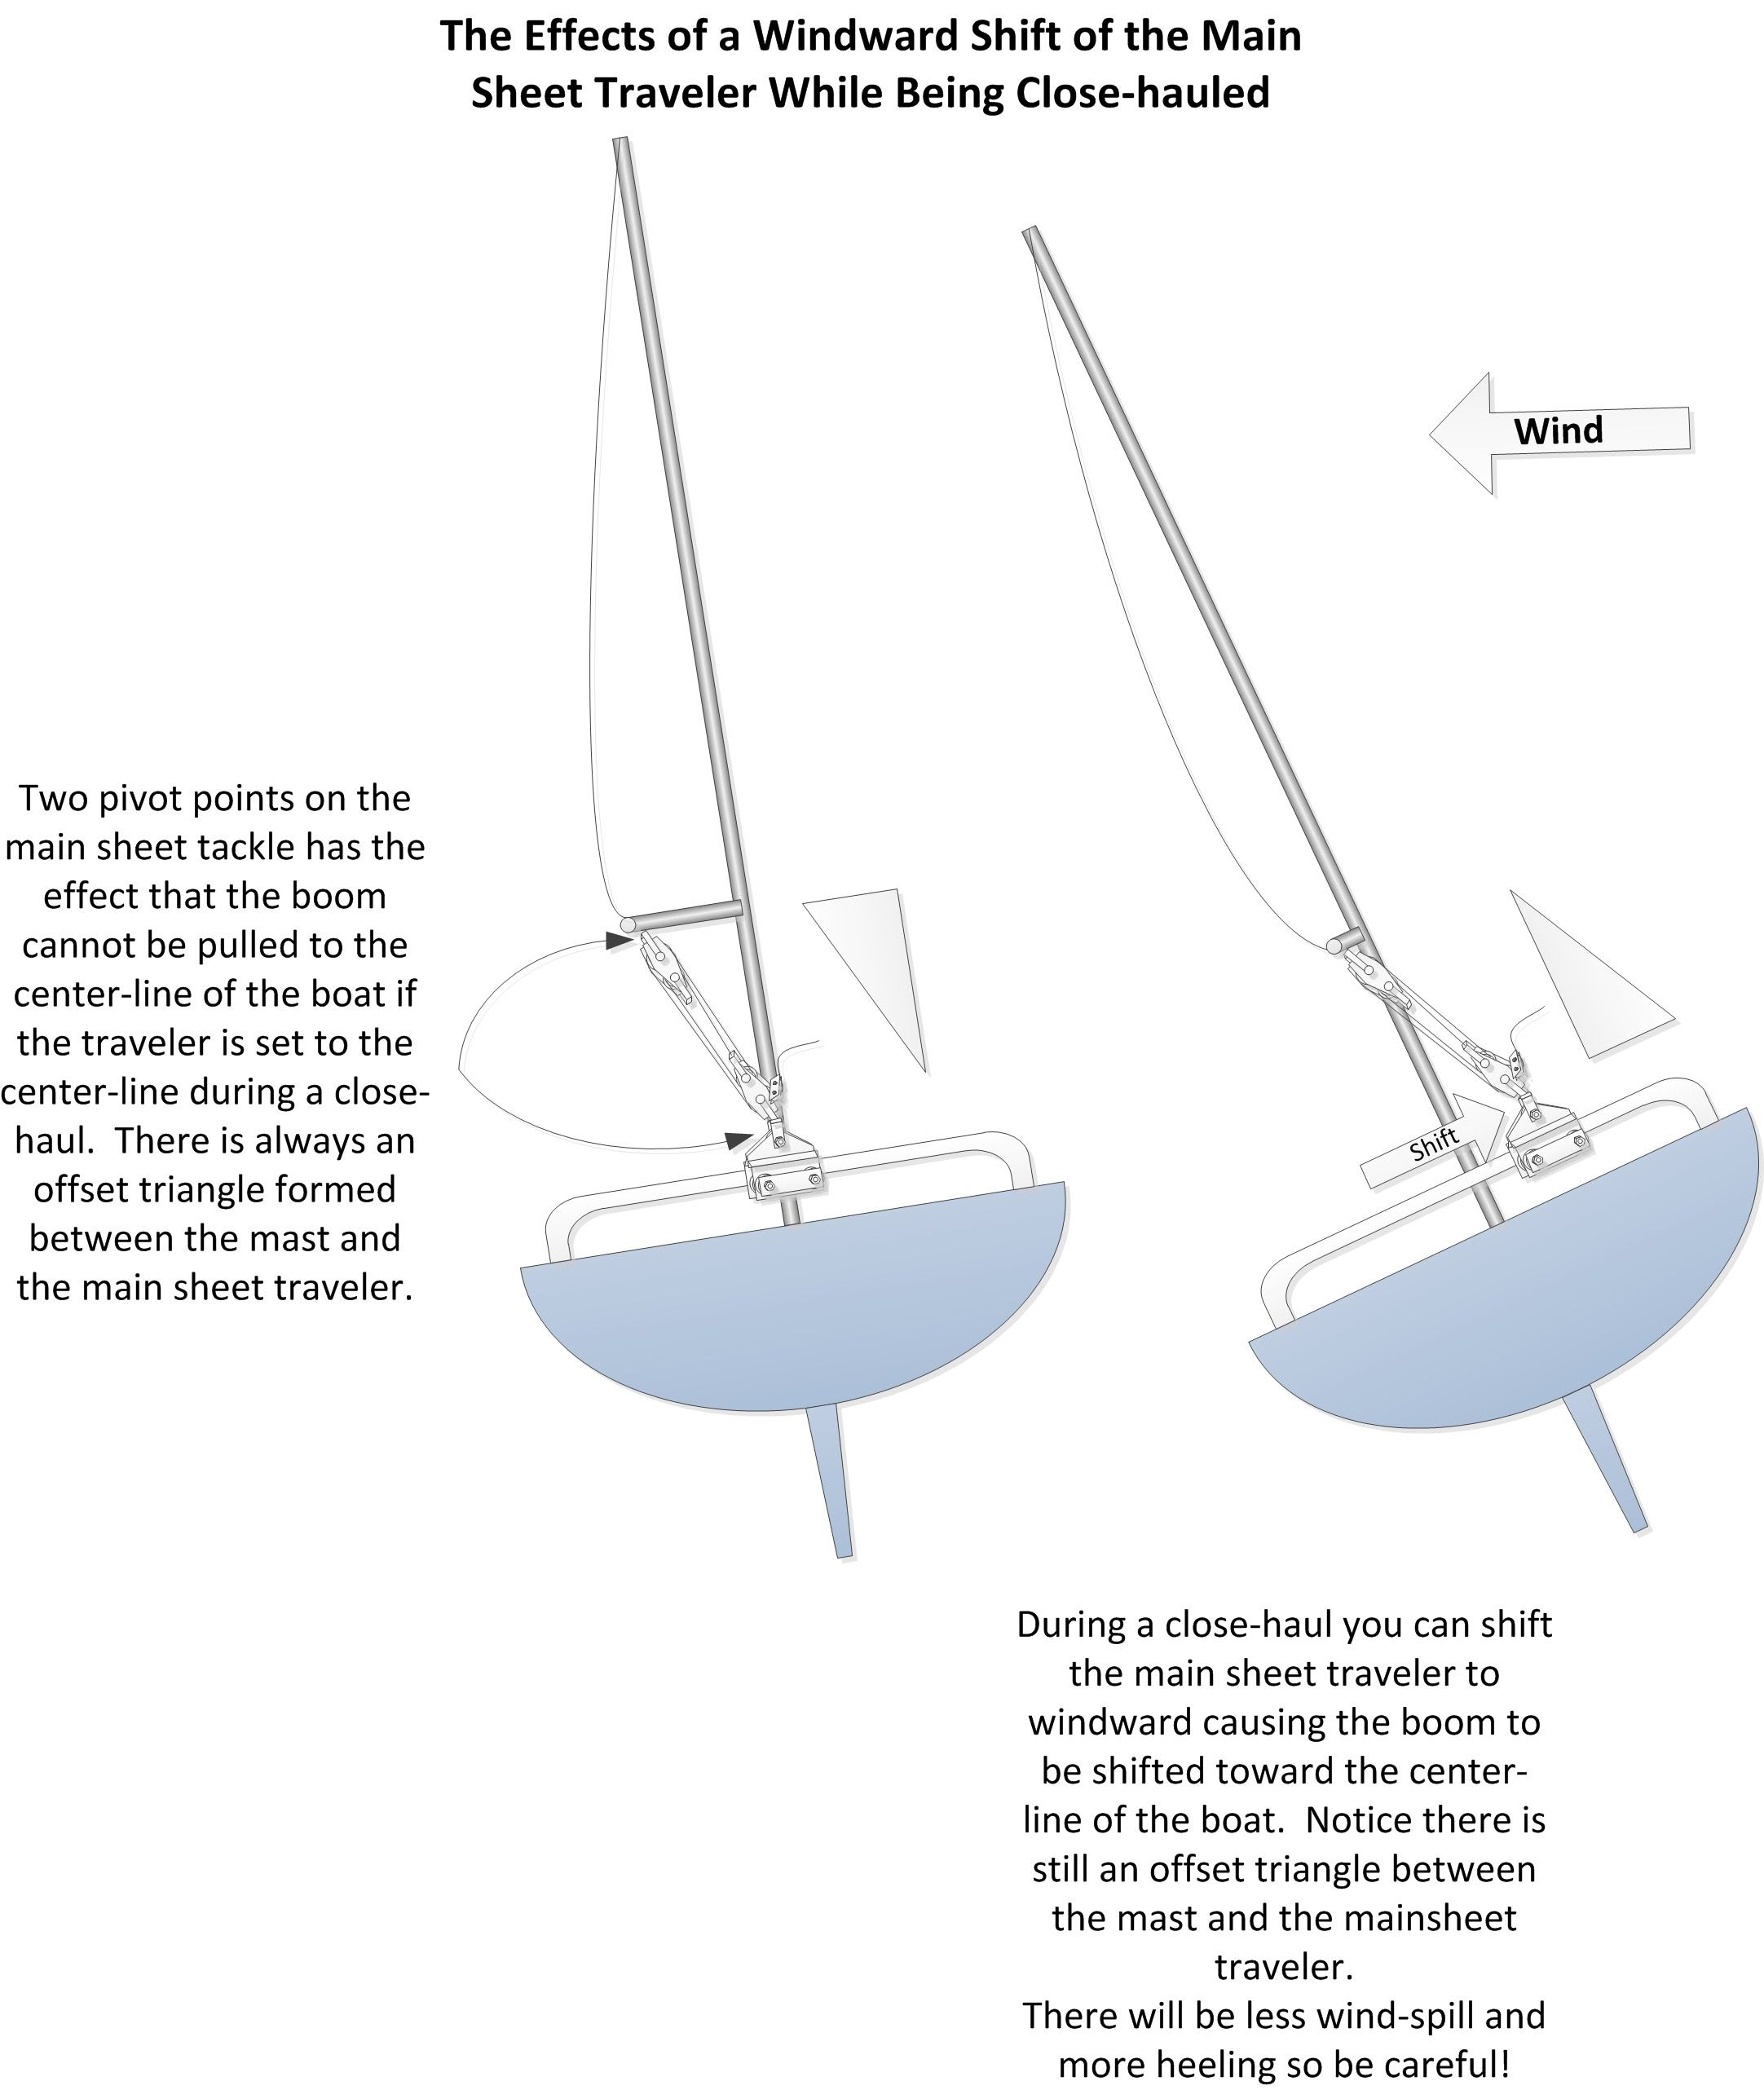 upgrades repairs c22 c 22 catalina 22 sailboat modifications projects catalina rigging maintenance maintaining mast stepping restoring  [ 2164 x 2564 Pixel ]